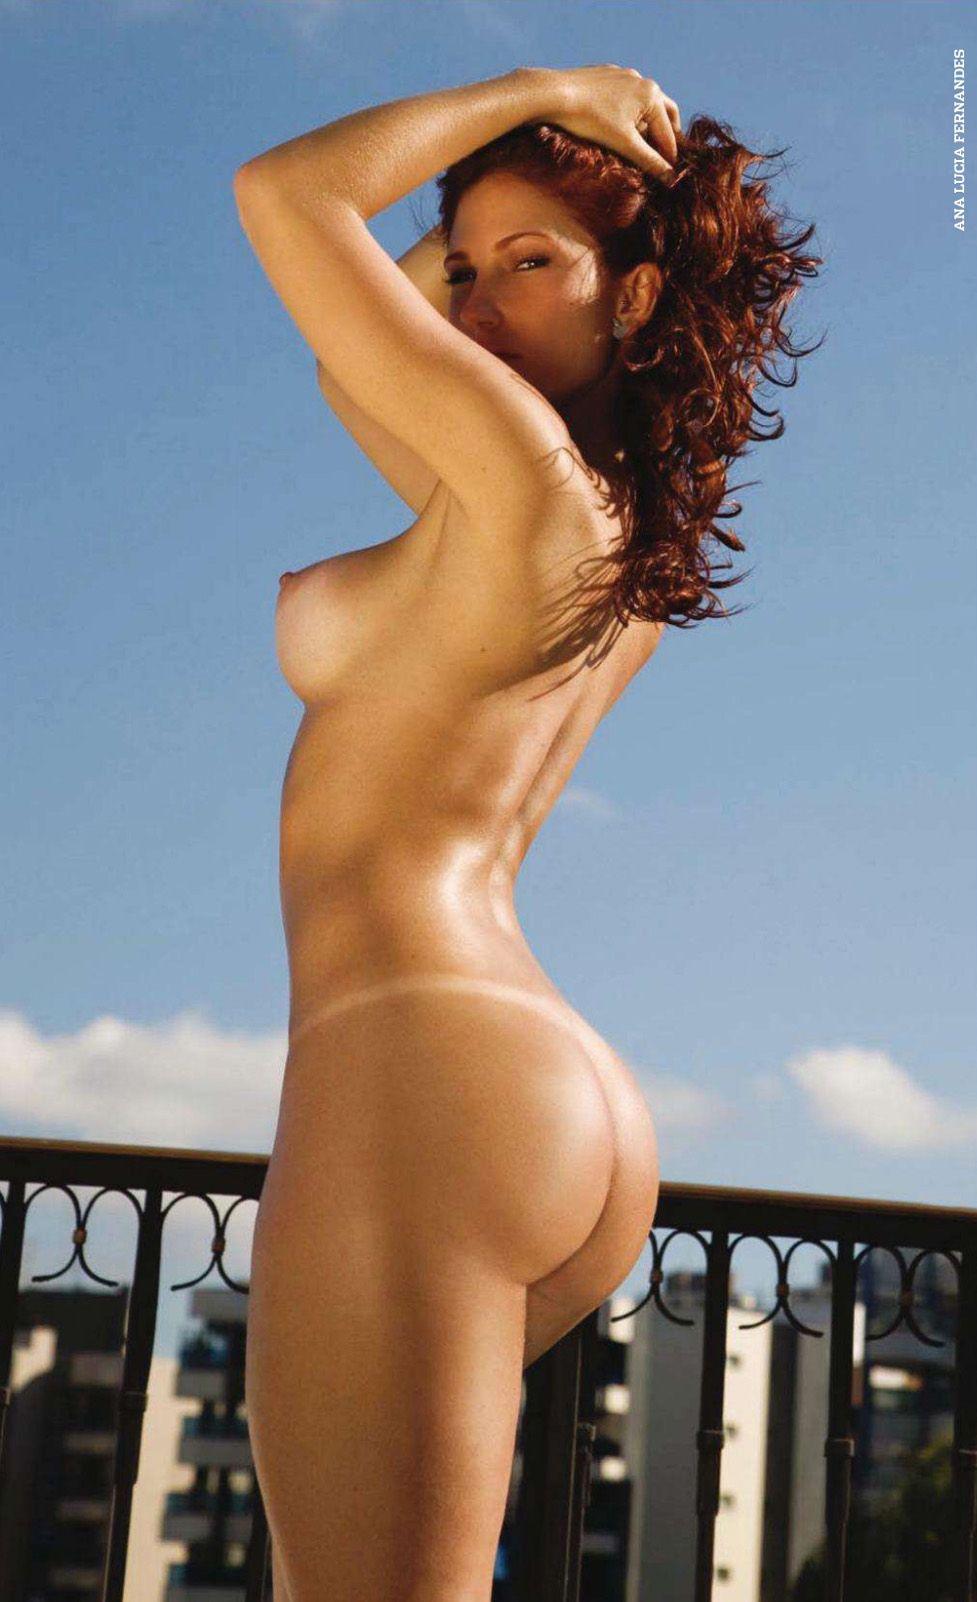 бразильские девушки / Especial Brasilenas in Playboy Spain january 2011 - Ana Lucia Fernandes